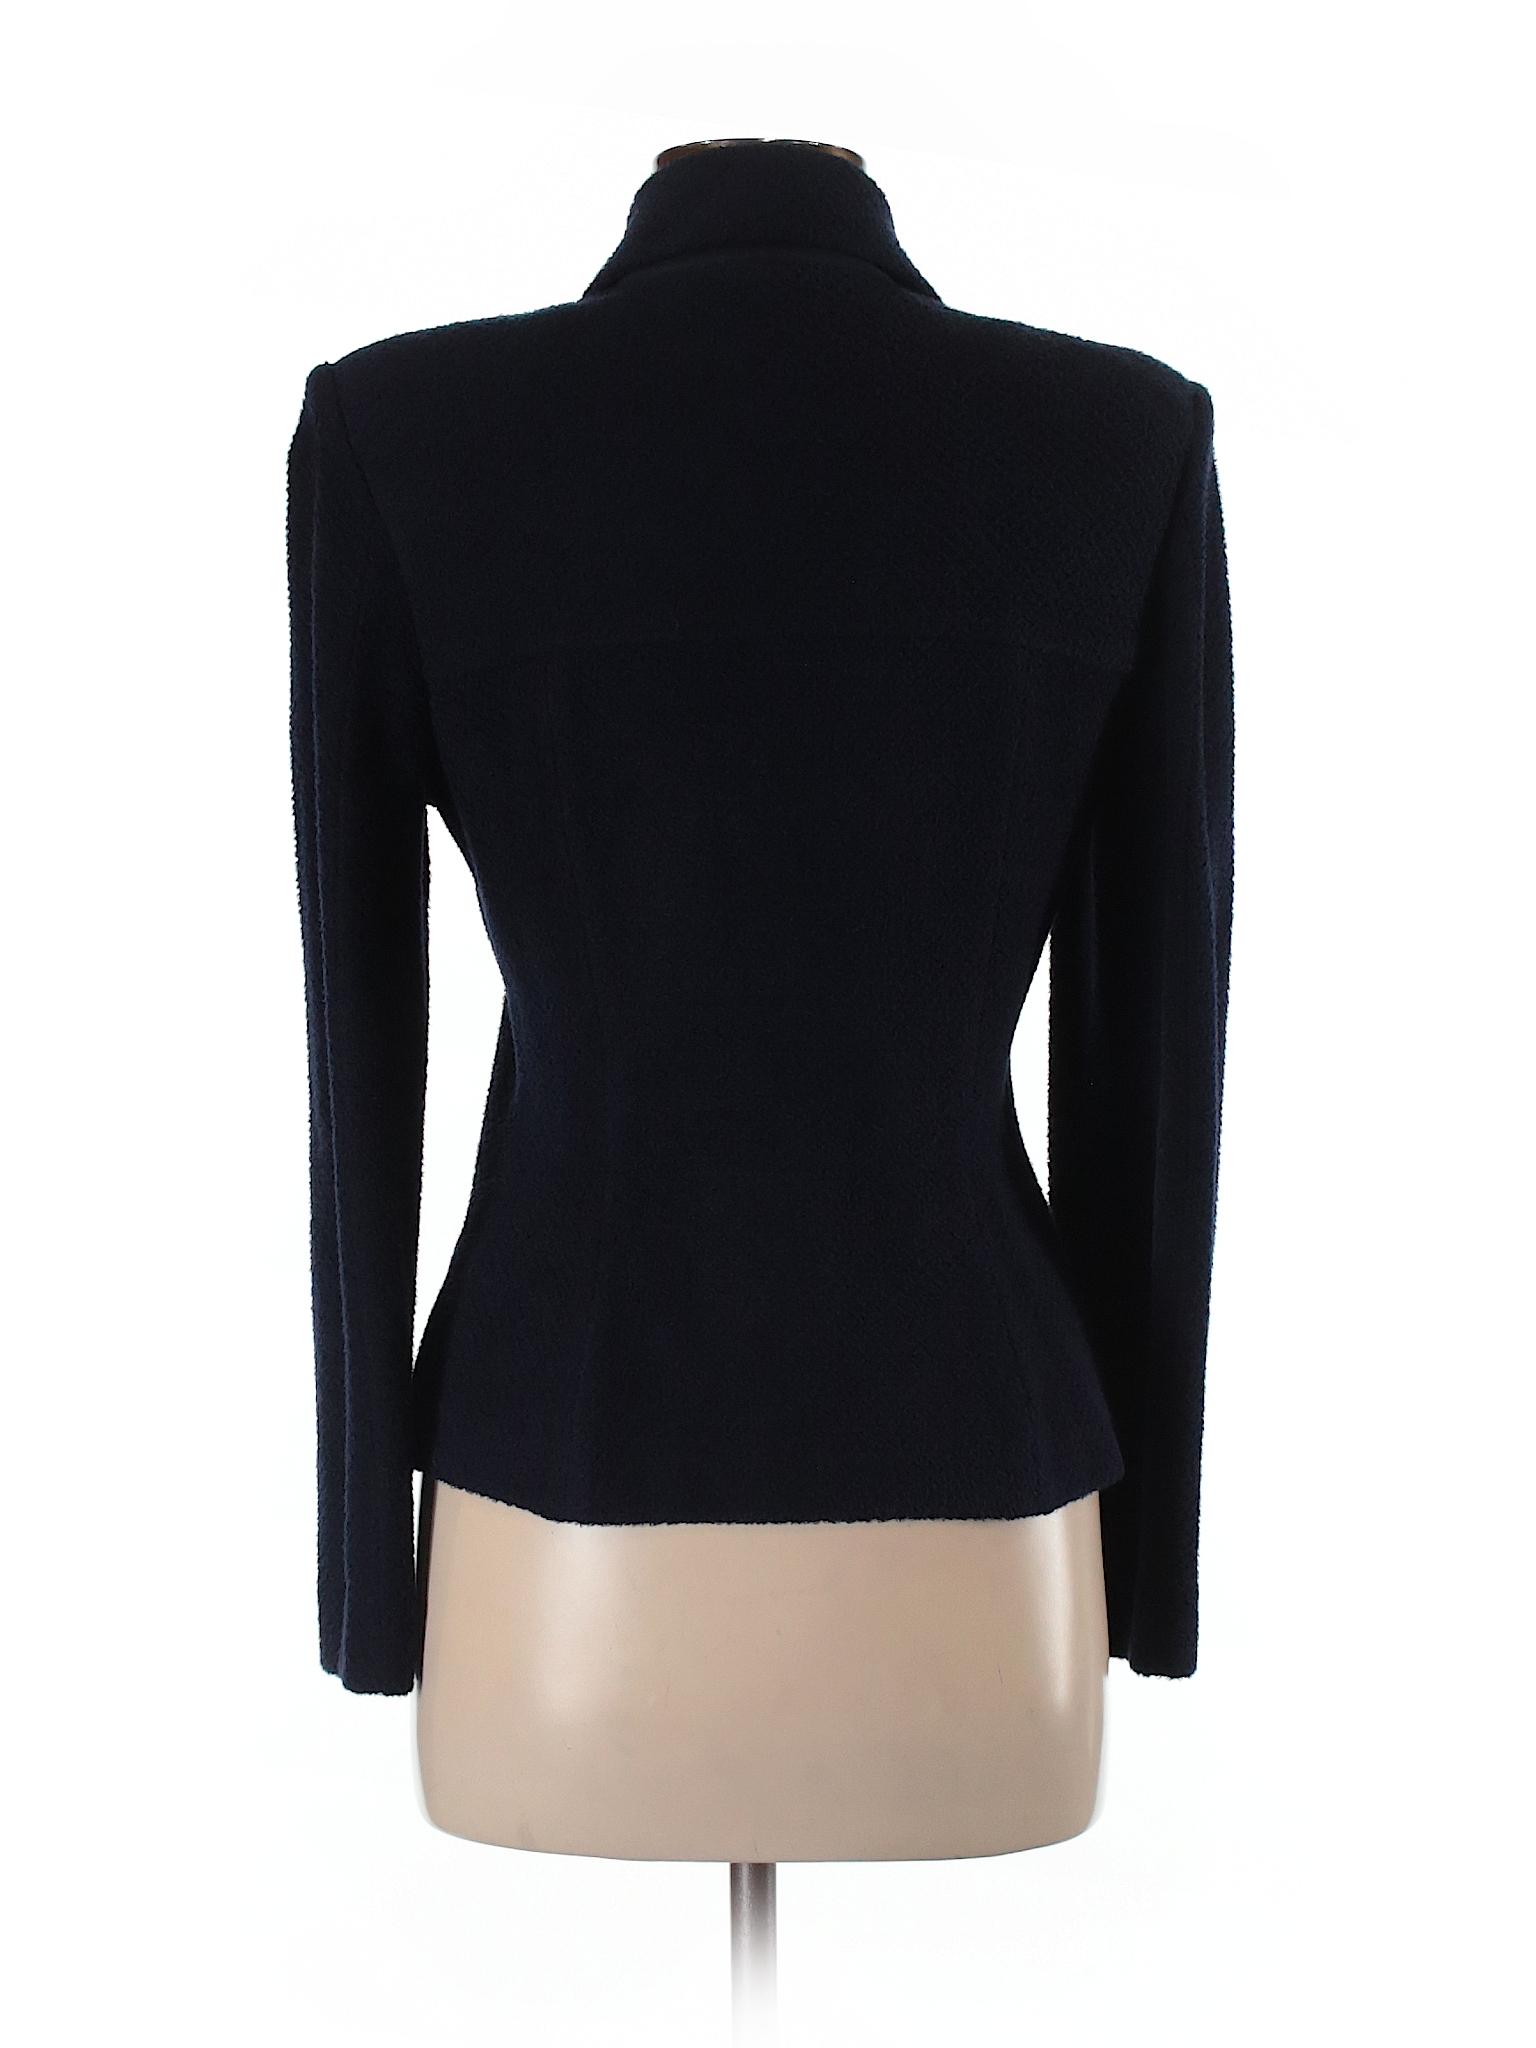 Boutique Wool Blazer Collection leisure John St wxq1UwSf